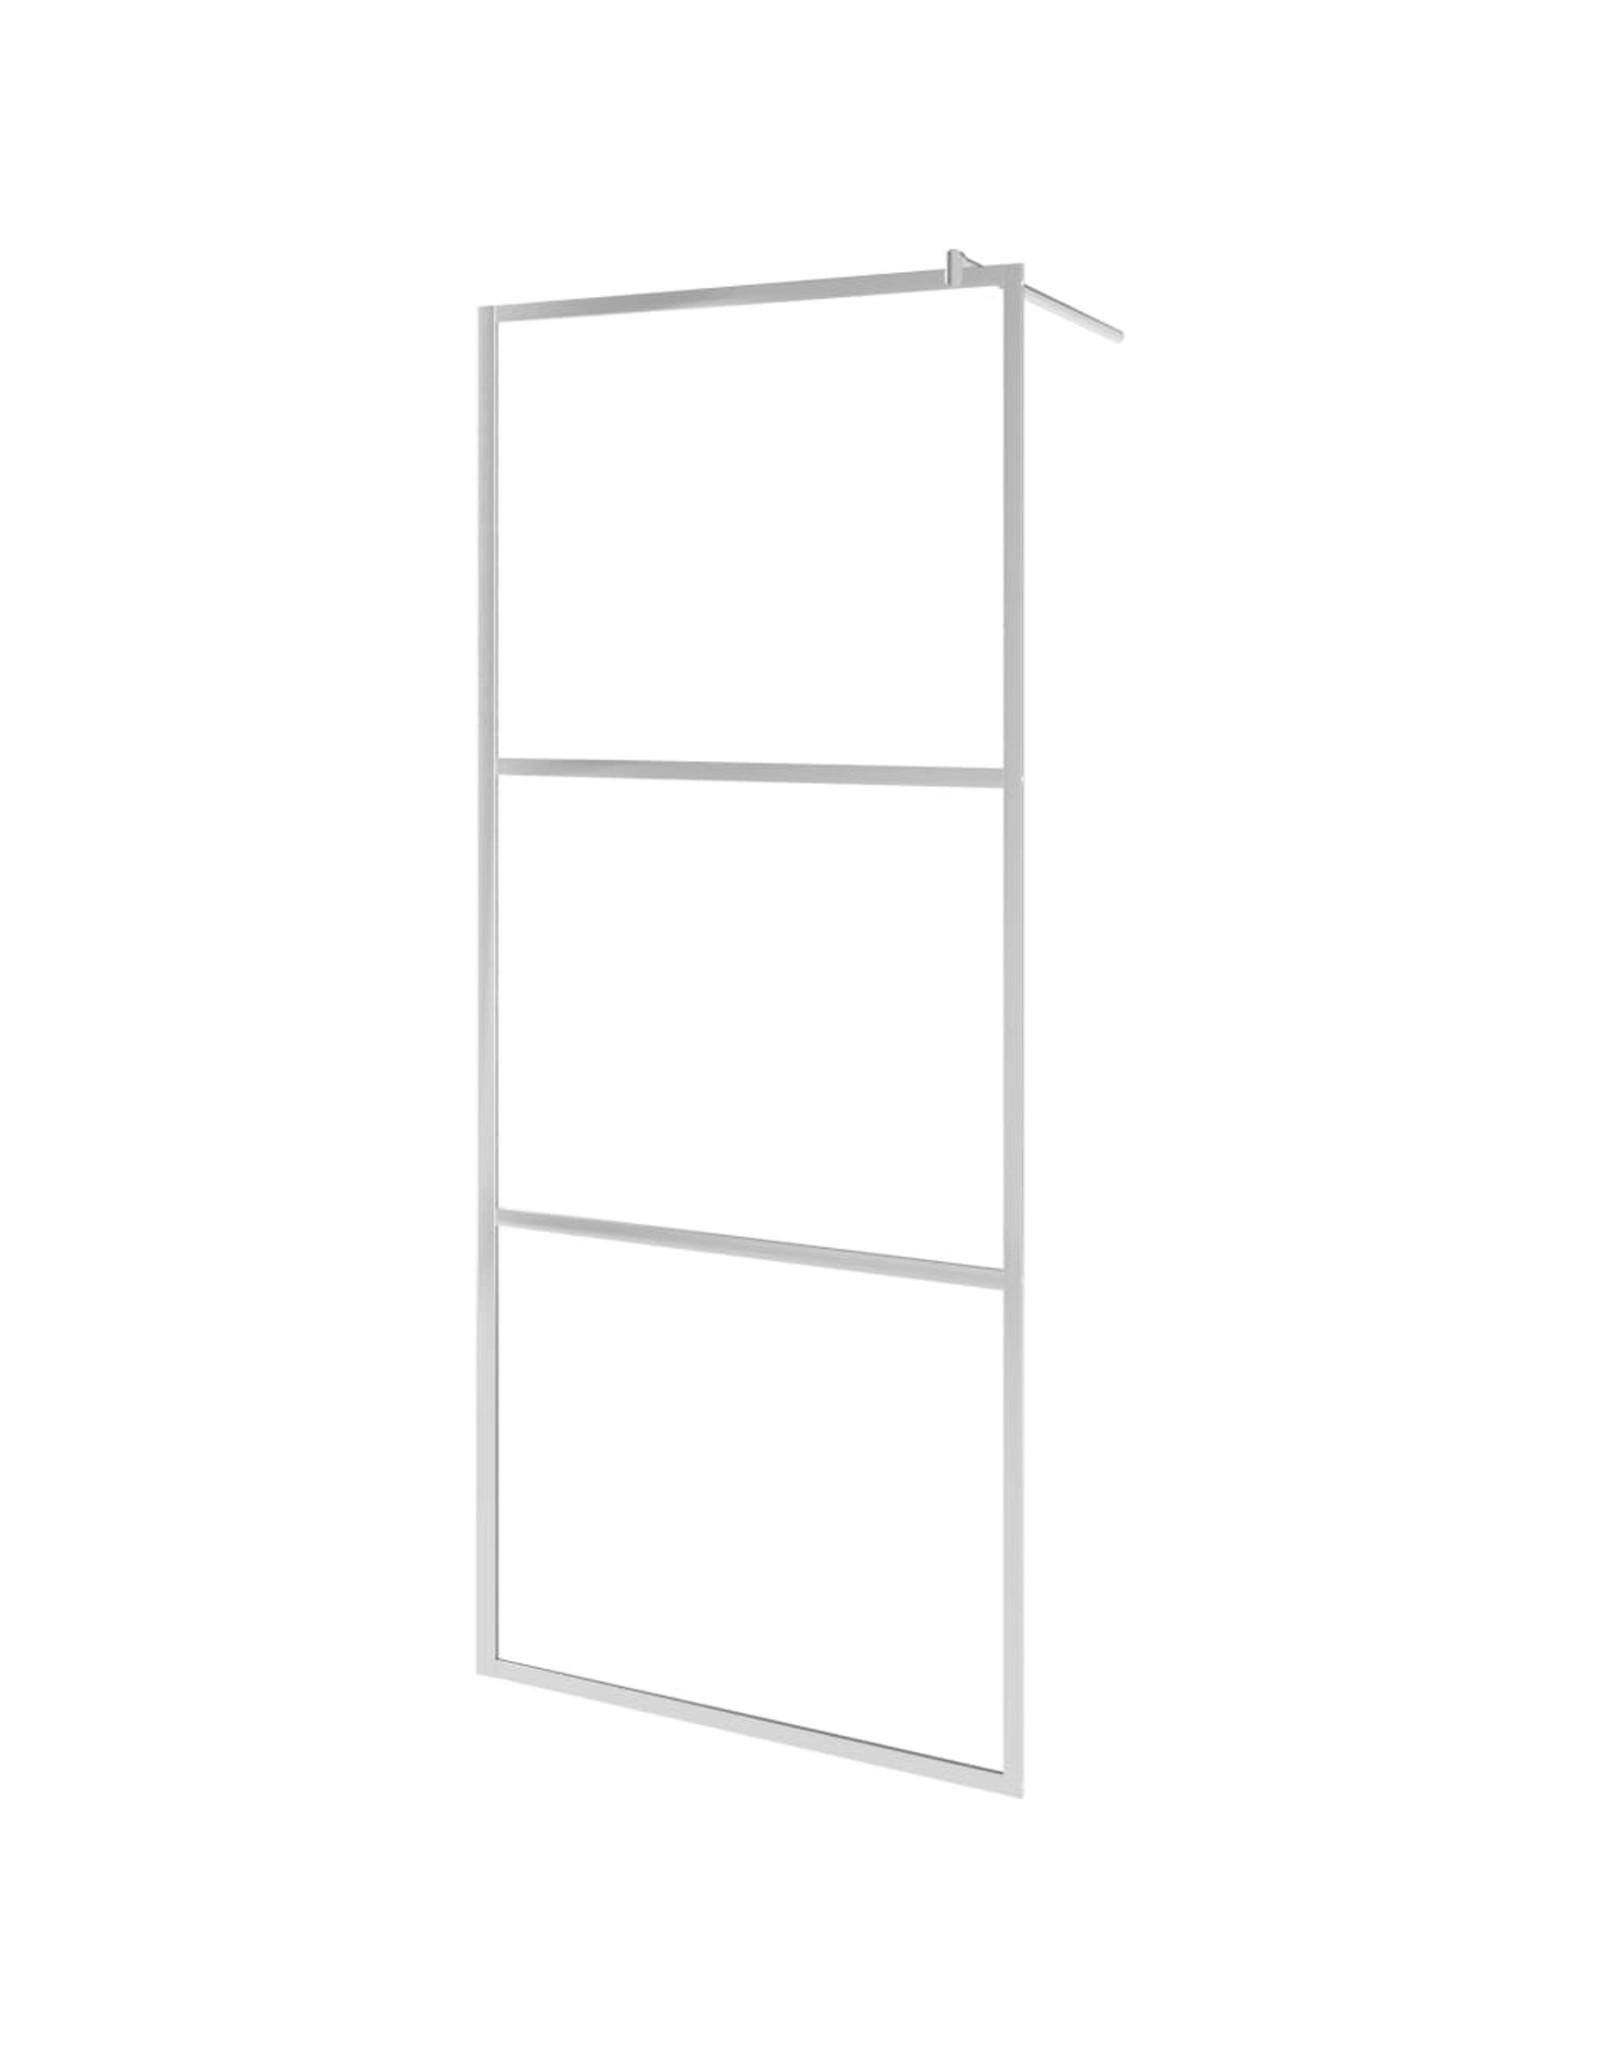 Inloopdouchewand halfmat 100x195 cm ESG-glas